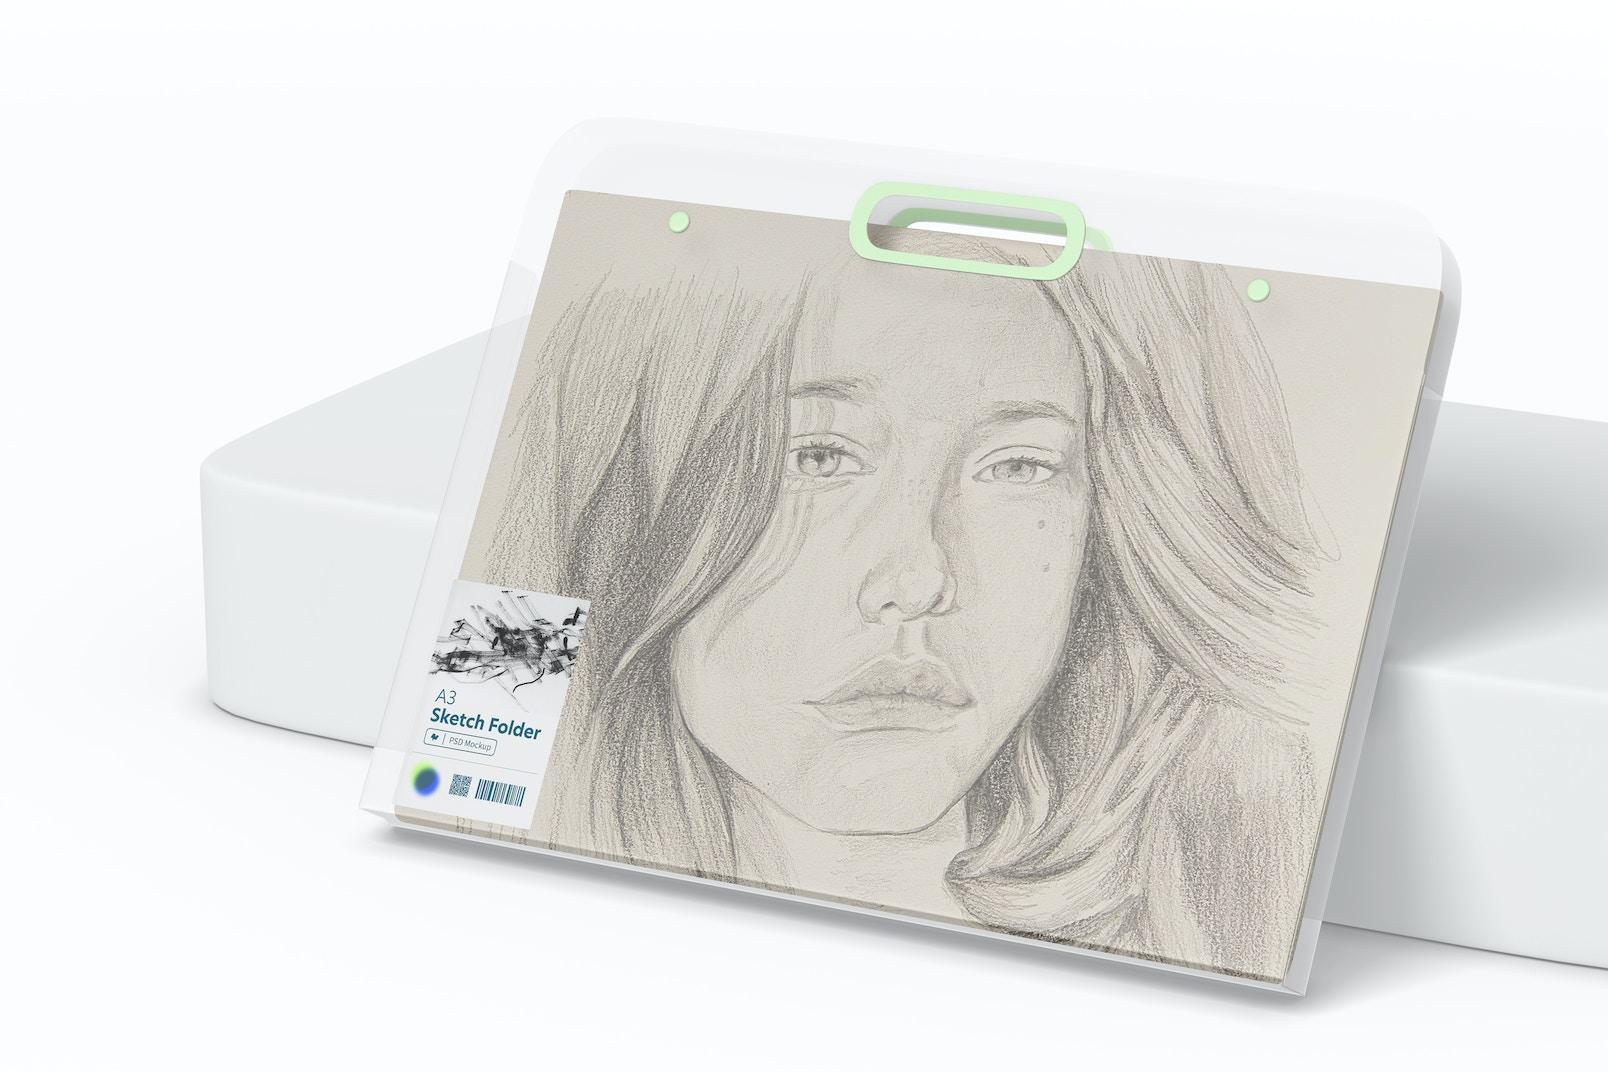 A3 Sketch Folder Mockup